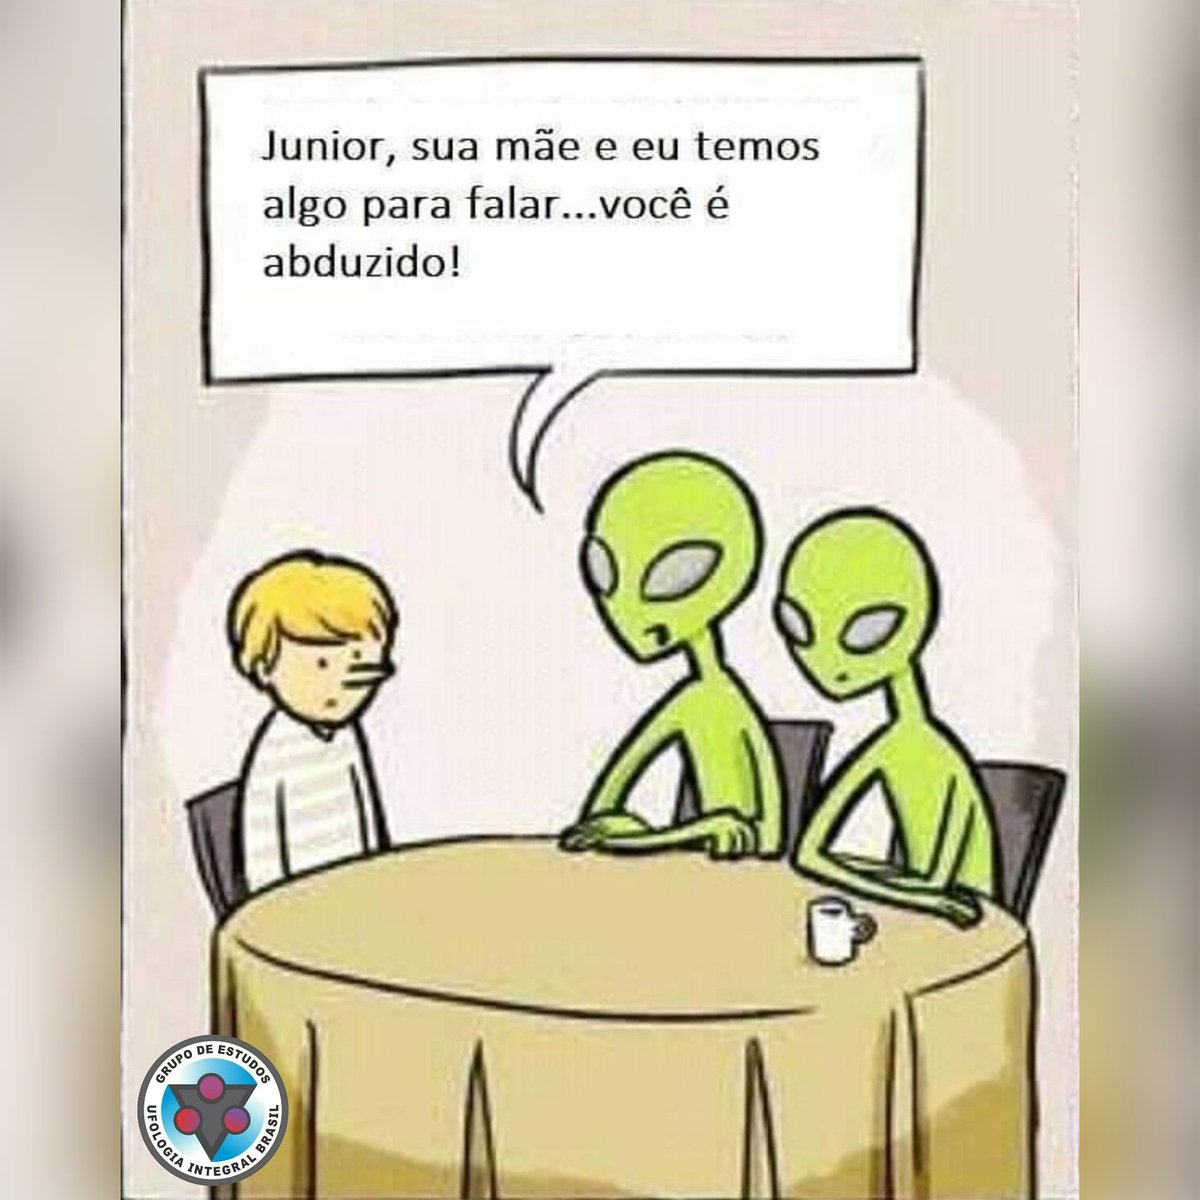 E você, sente que já foi abduzido? #ufobrasil #ufologiabrasileira #ufology #ufointegral #ufoarqueologia #ufologia #ufologiaintegral #ufoart #ufologiaintegralbrasil #ufointegrada #ufosighting #ufologo #ufo #ovni #et #extraterrestre #abducao #abduzido #humorufologico pic.twitter.com/SXuYKwMd2a